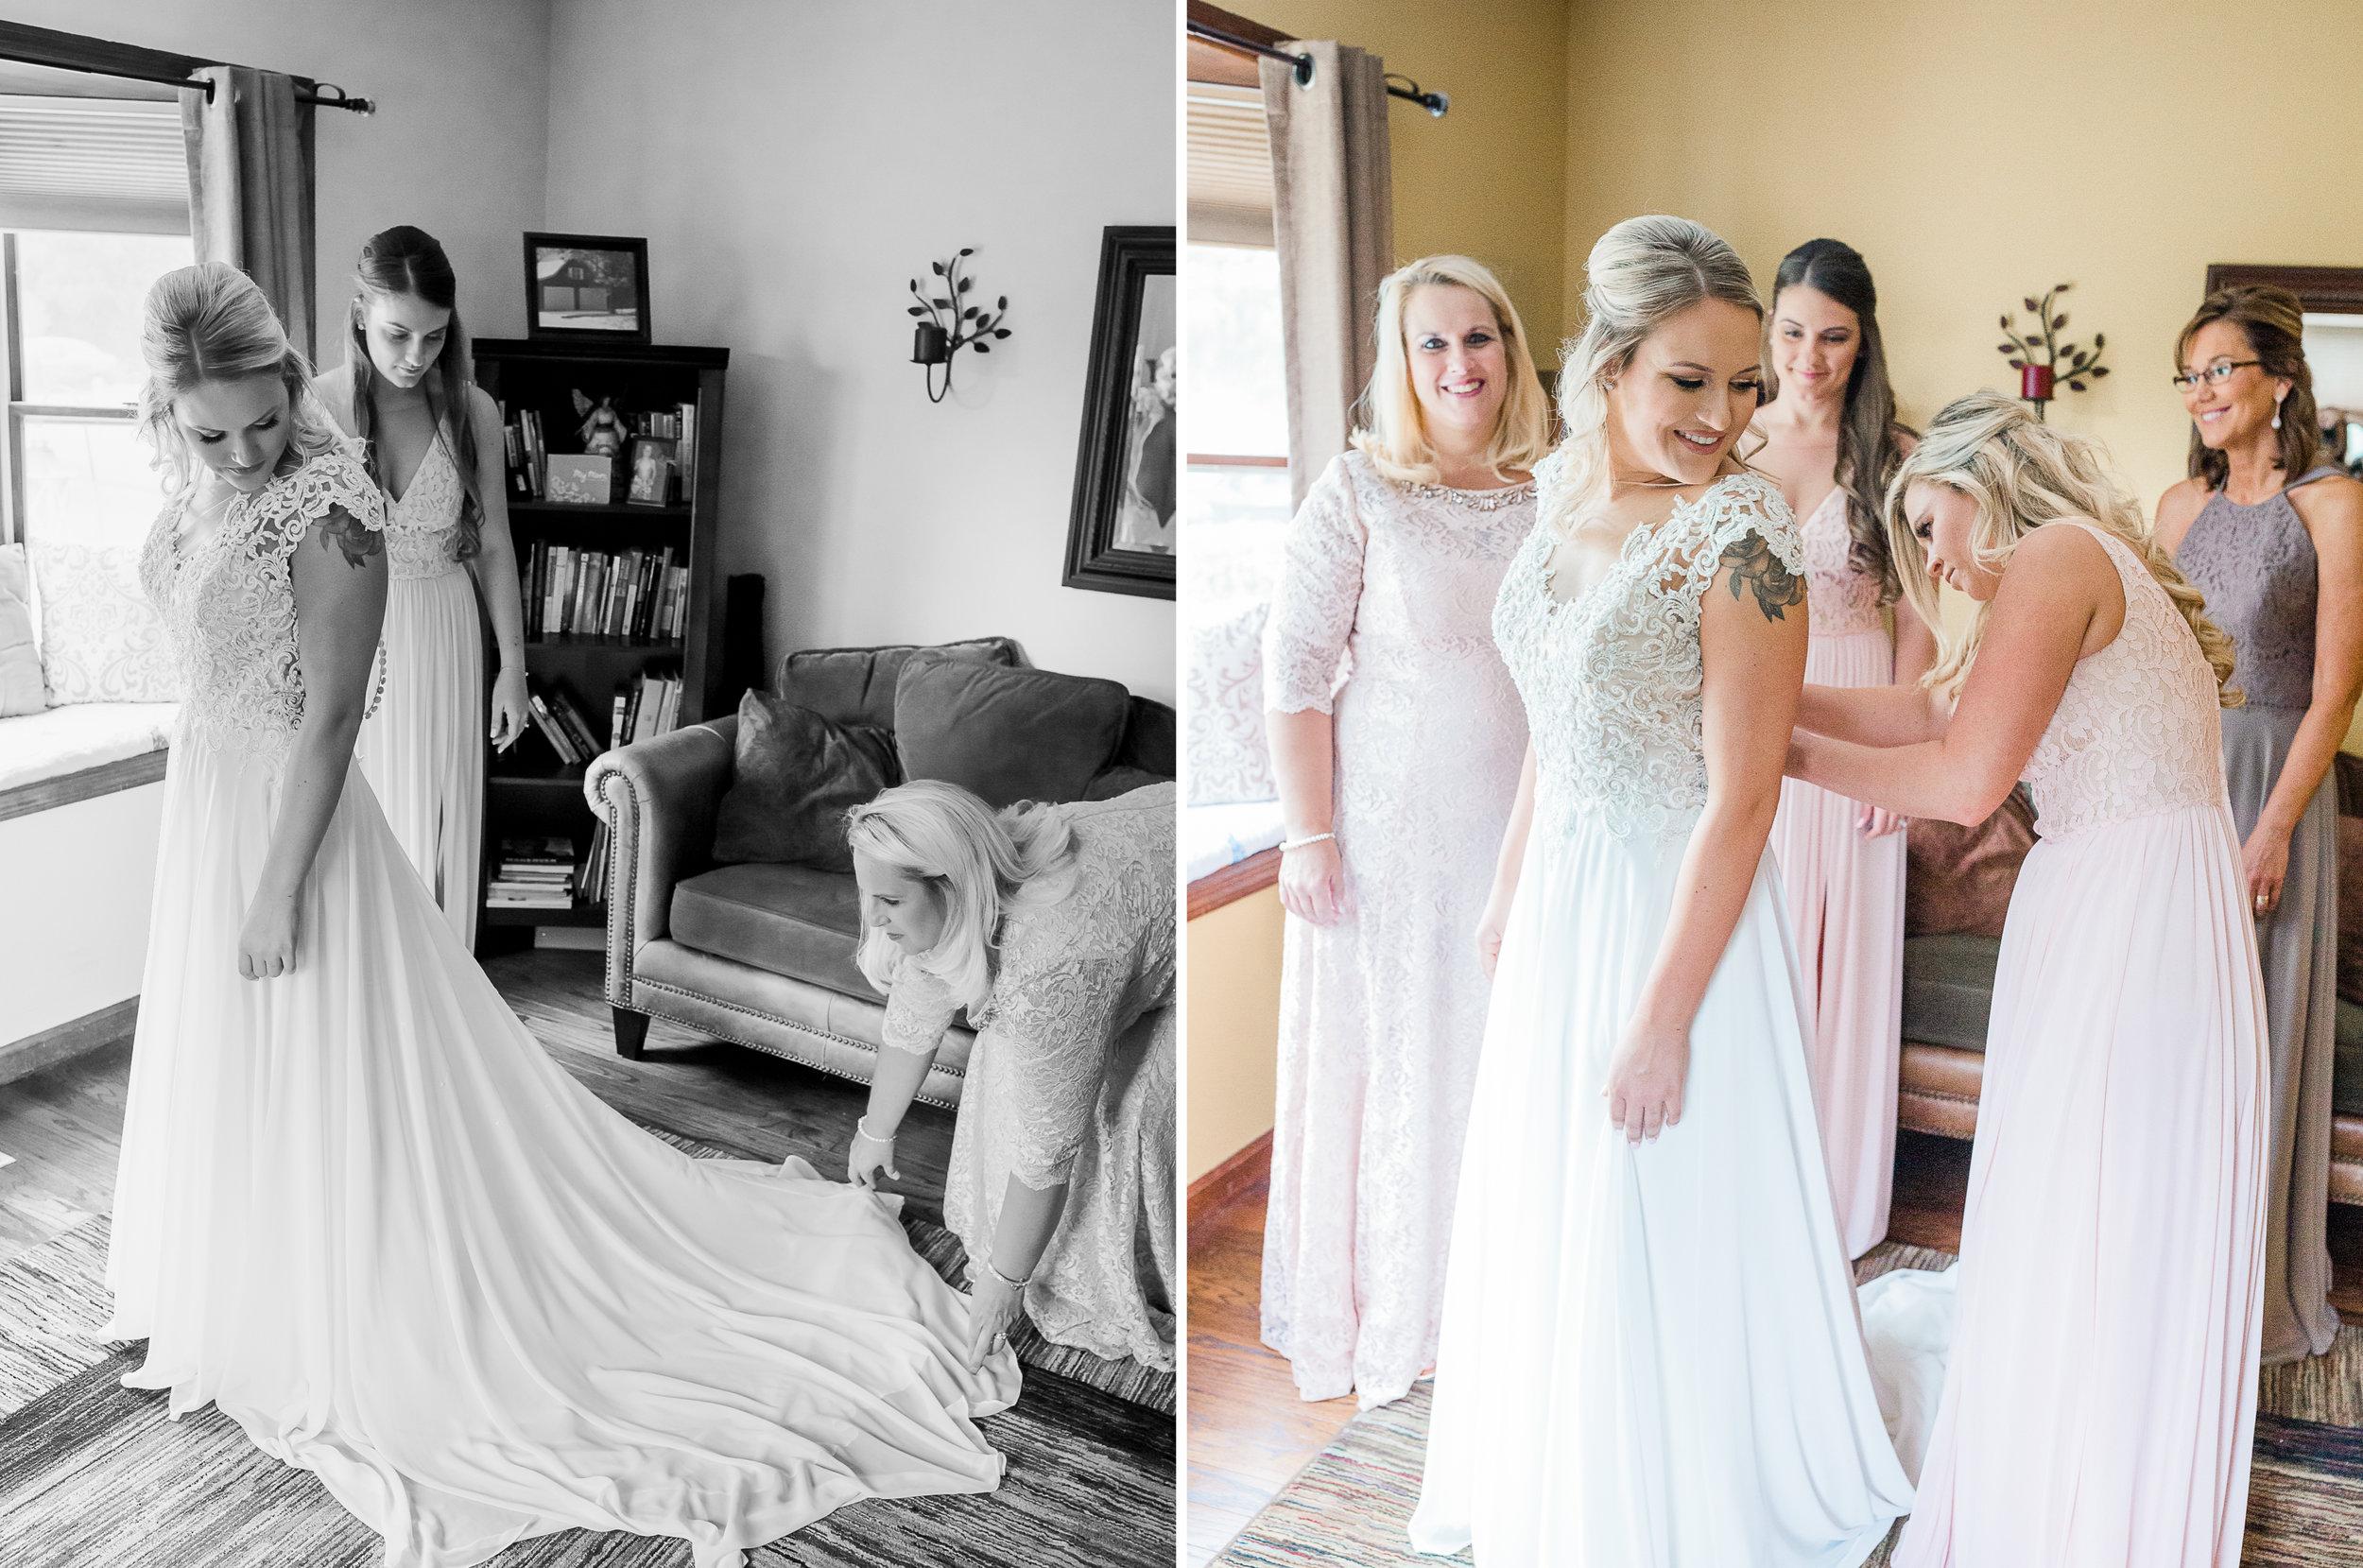 Dorothy_Louise_Photography_Marissa_Jake_Wentzville_MO_Wedding10.jpg